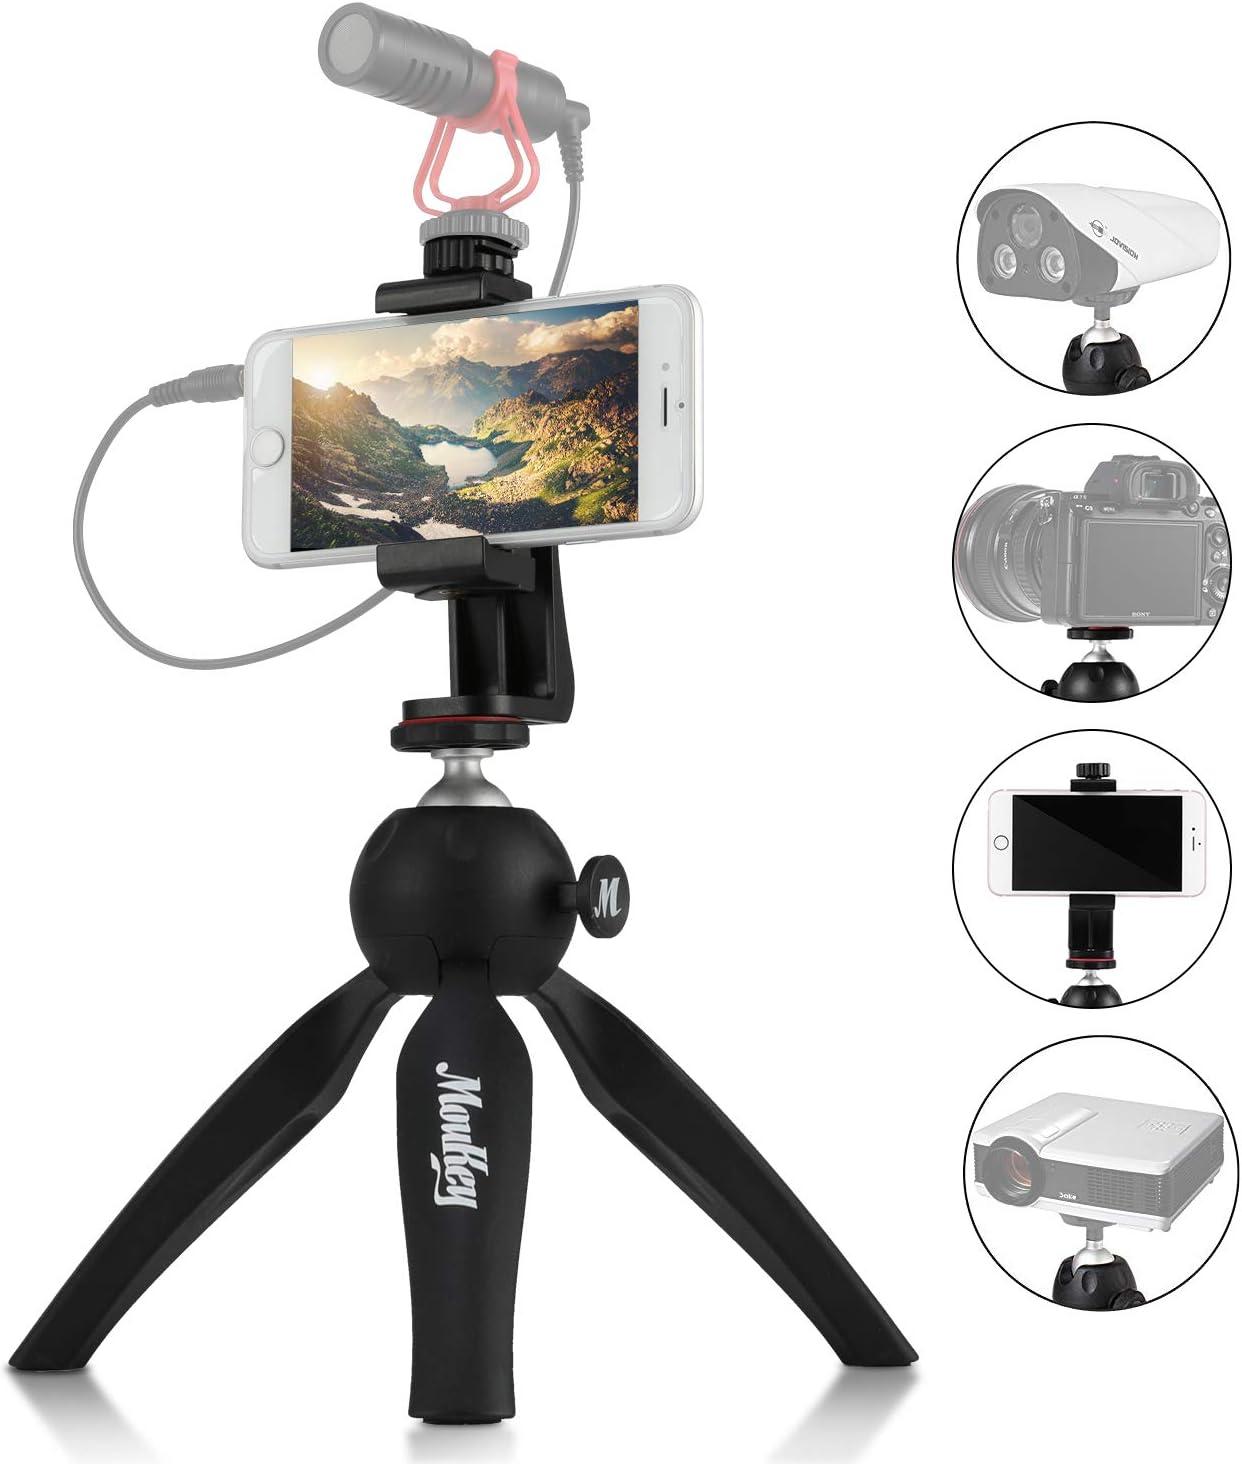 Moukey Mini Trípode Móvil/Cámara de Mesa para Smartphone, Gopro ...